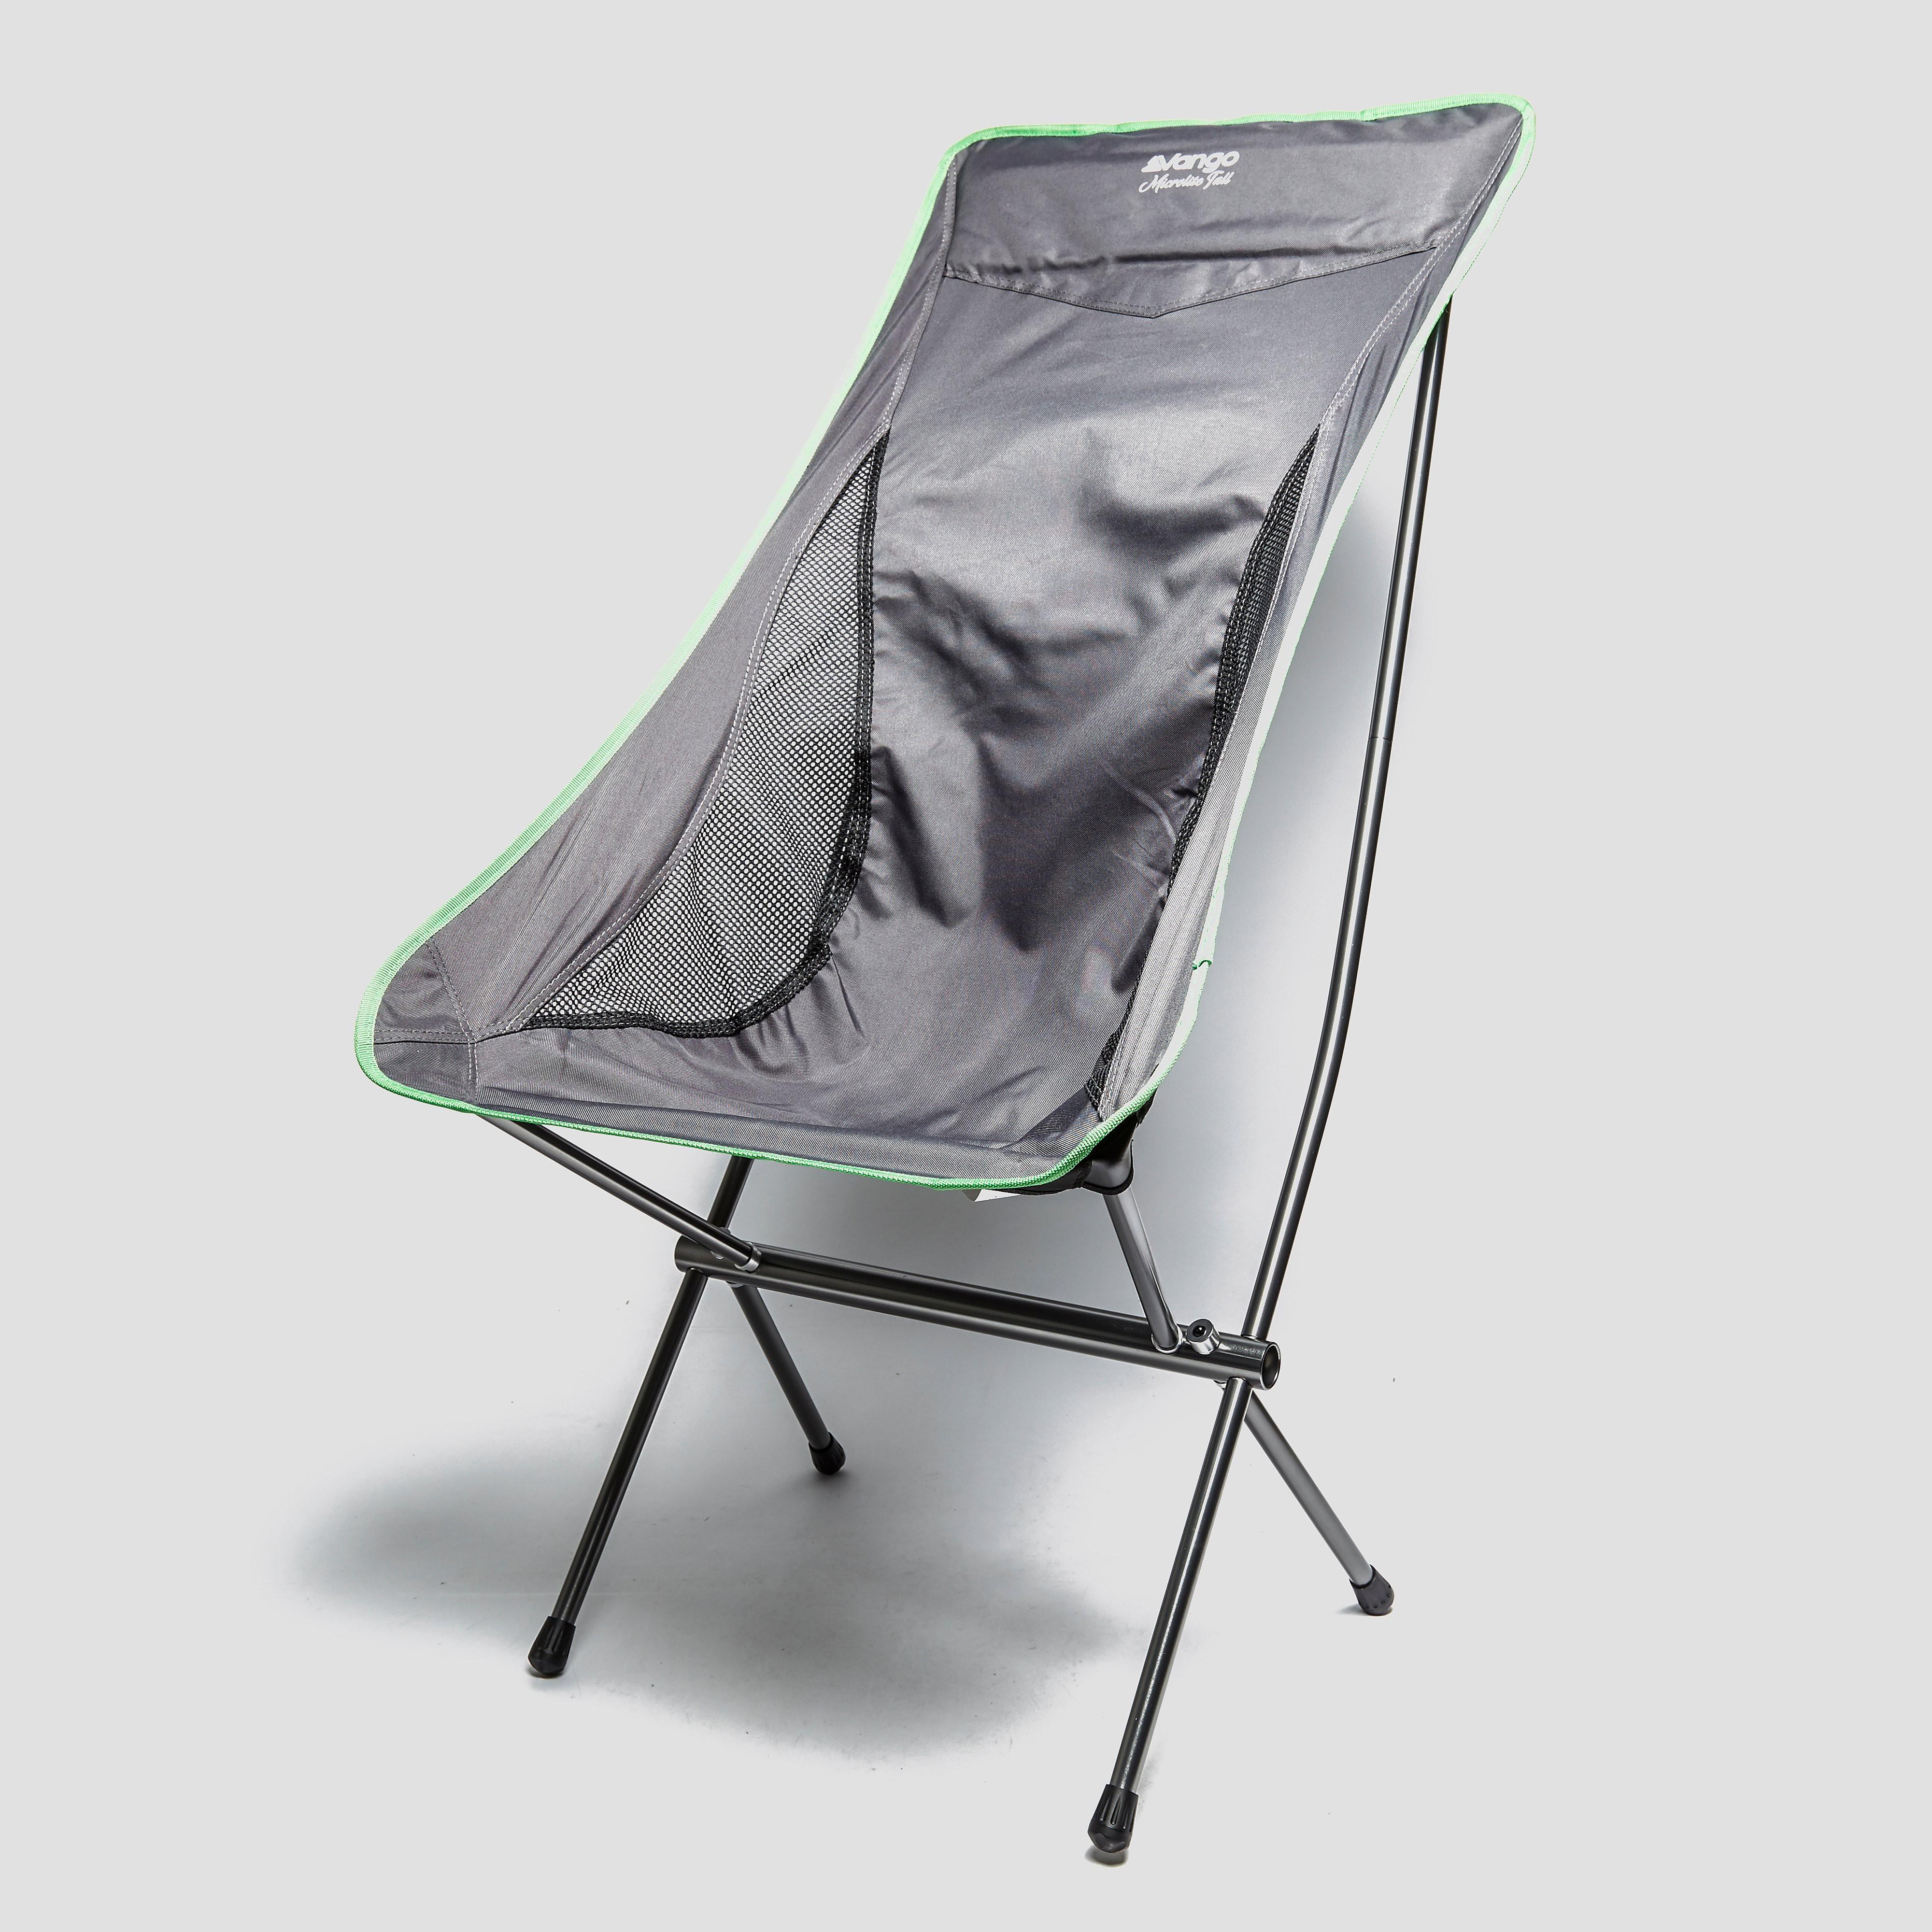 Vango Microlite Tall Chair